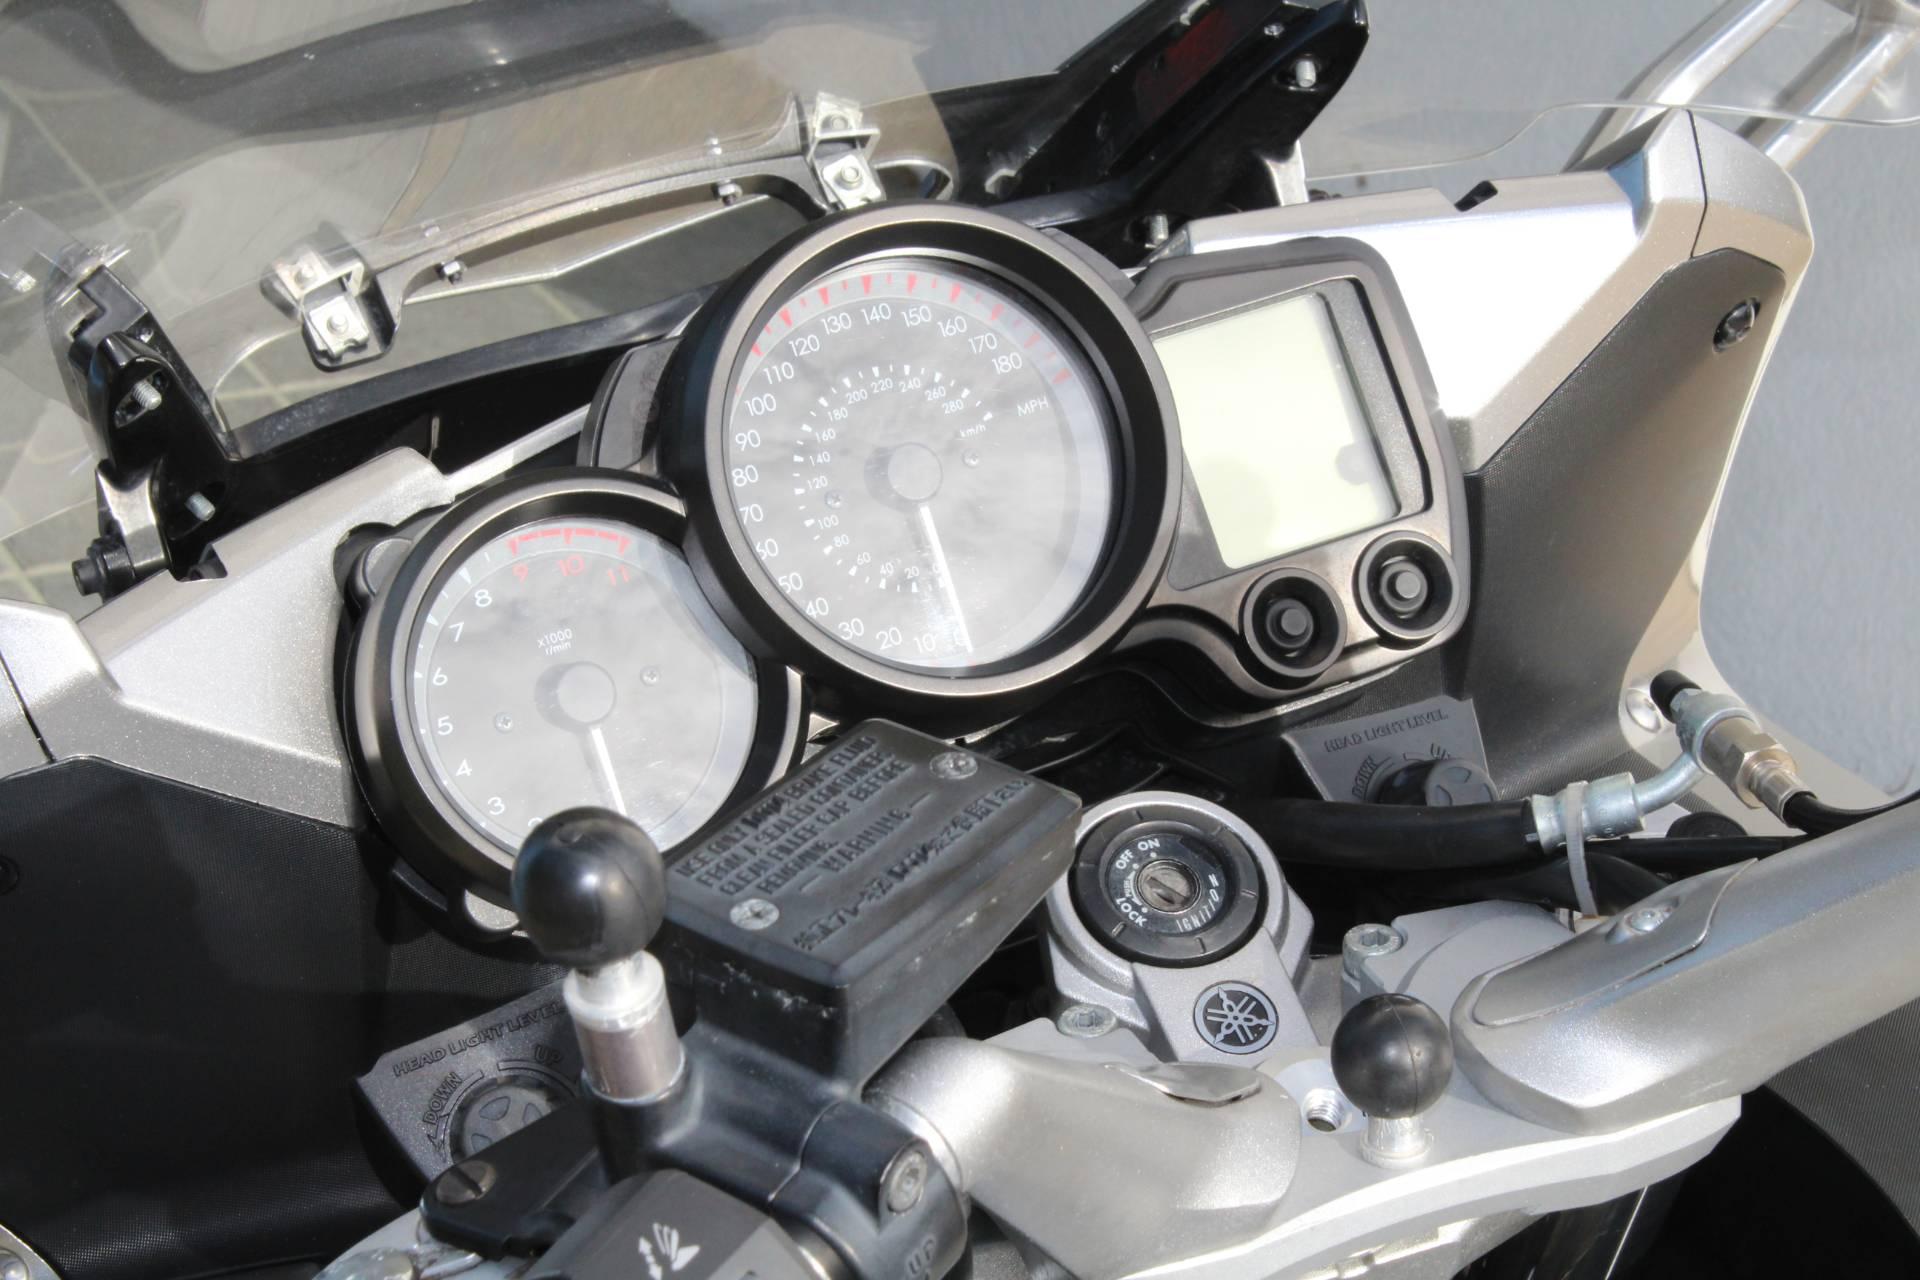 2010 Yamaha FJR1300A 10